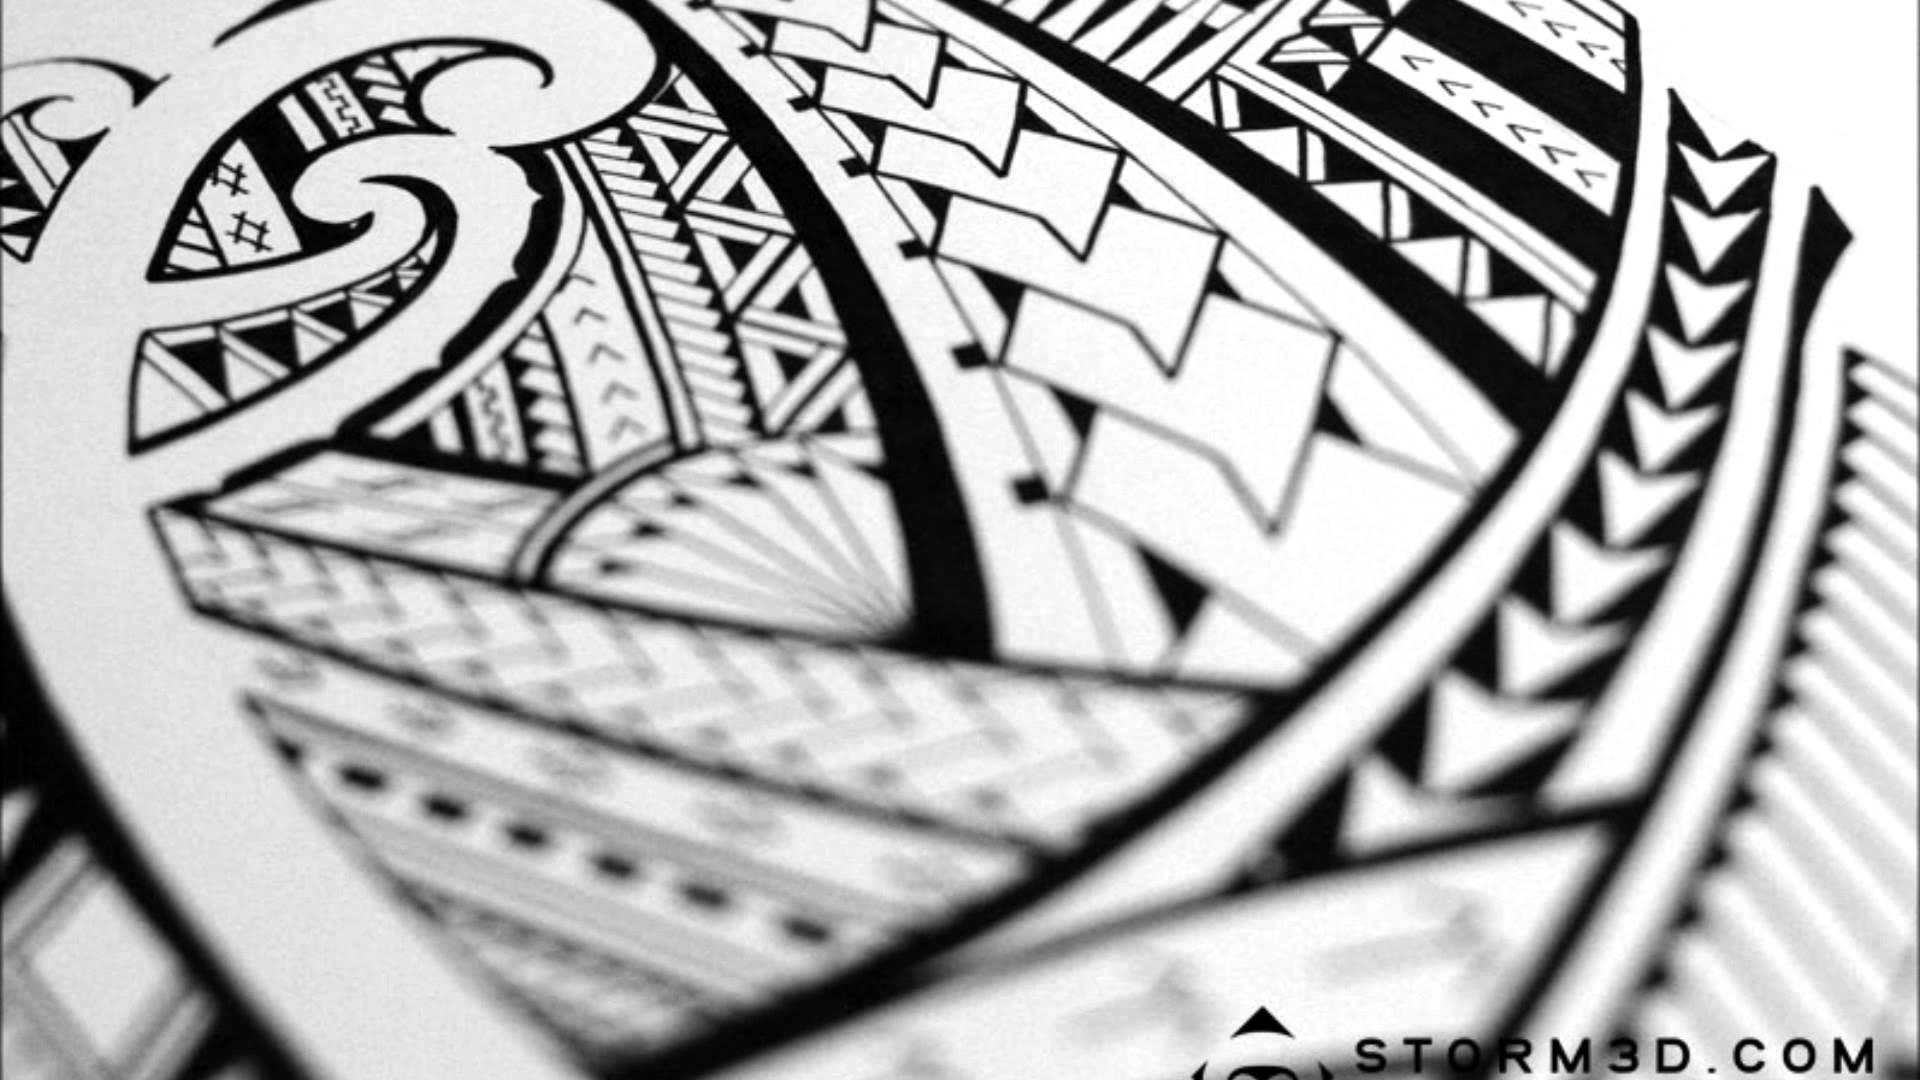 Res: 1920x1080, On M.F. Graphics: VNS.374 Polynesian Tribal Wallpaper, 0.16 Mb